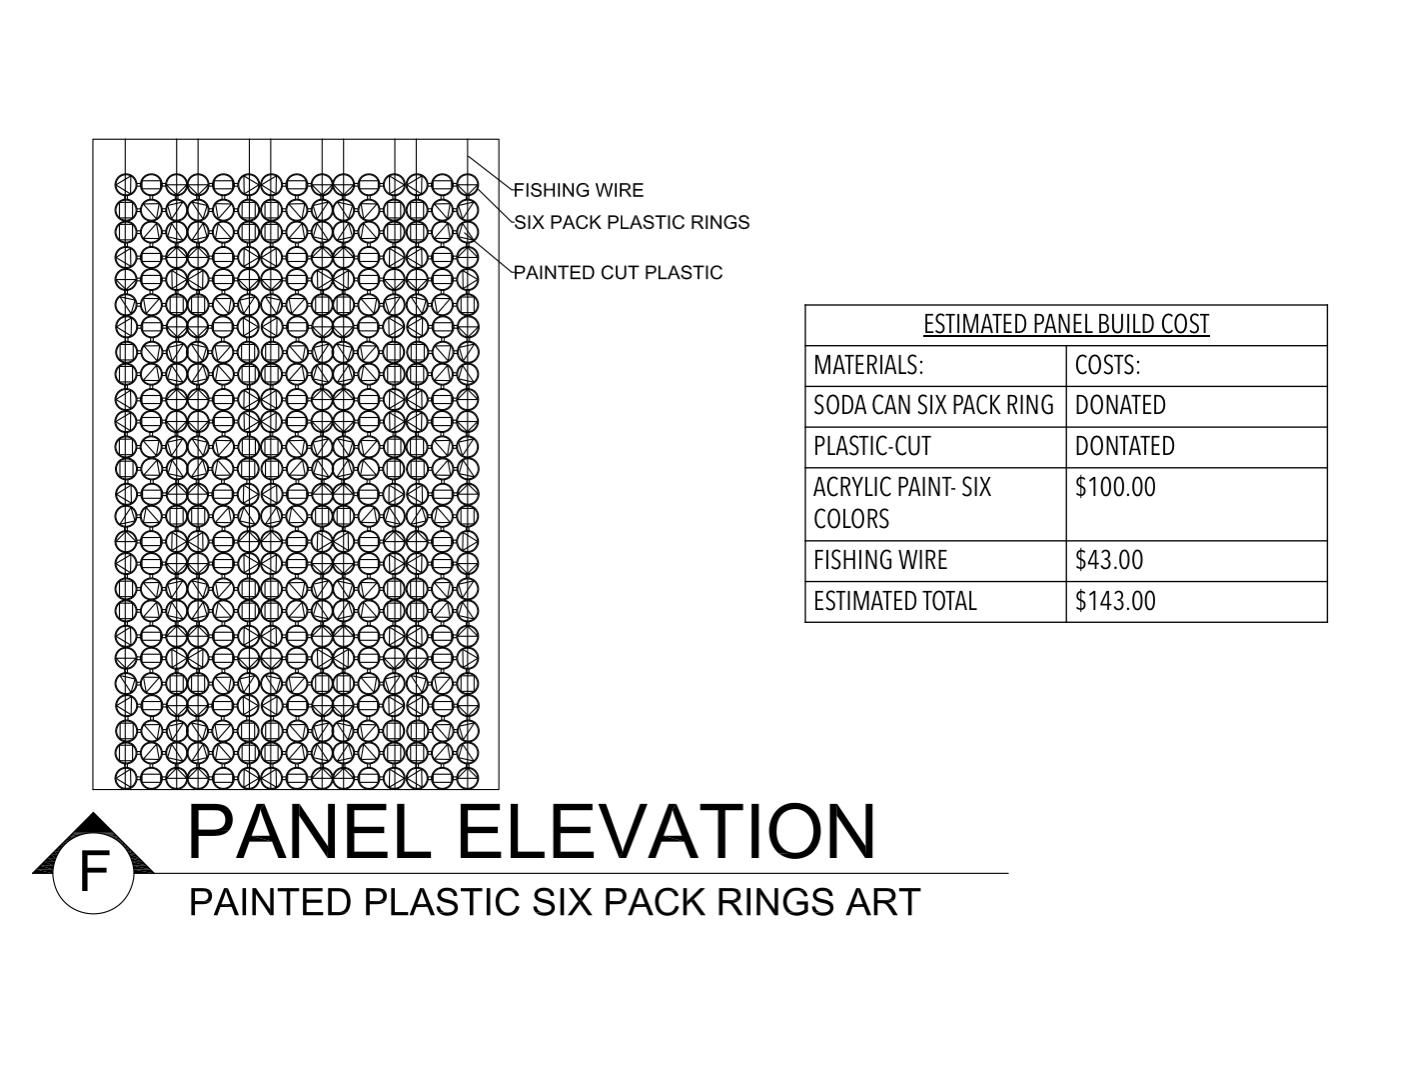 Panel Elevation F